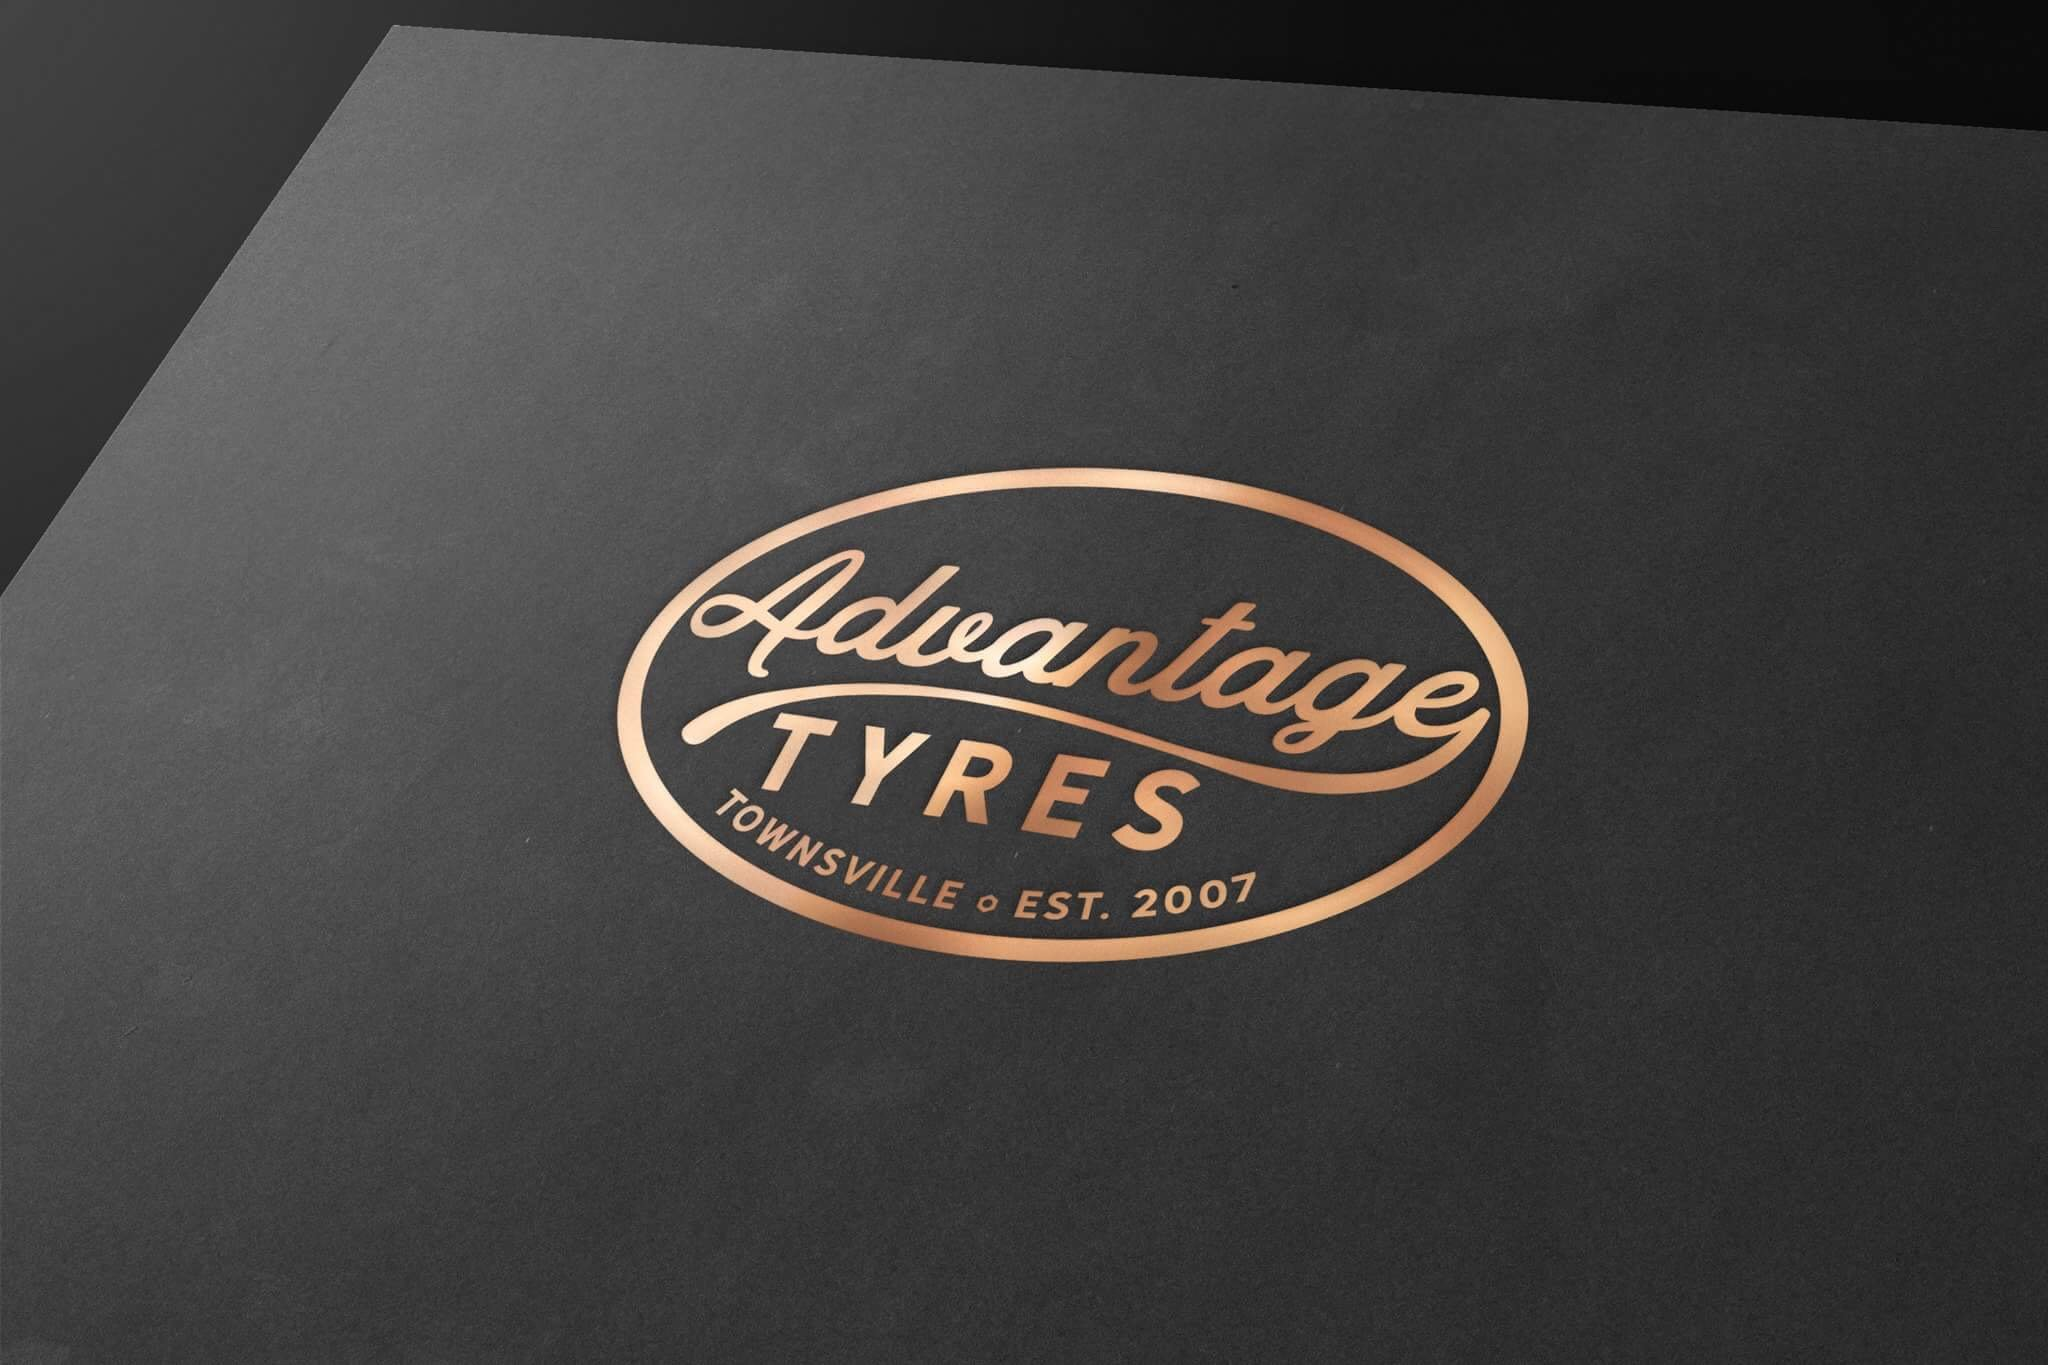 advantage tyres